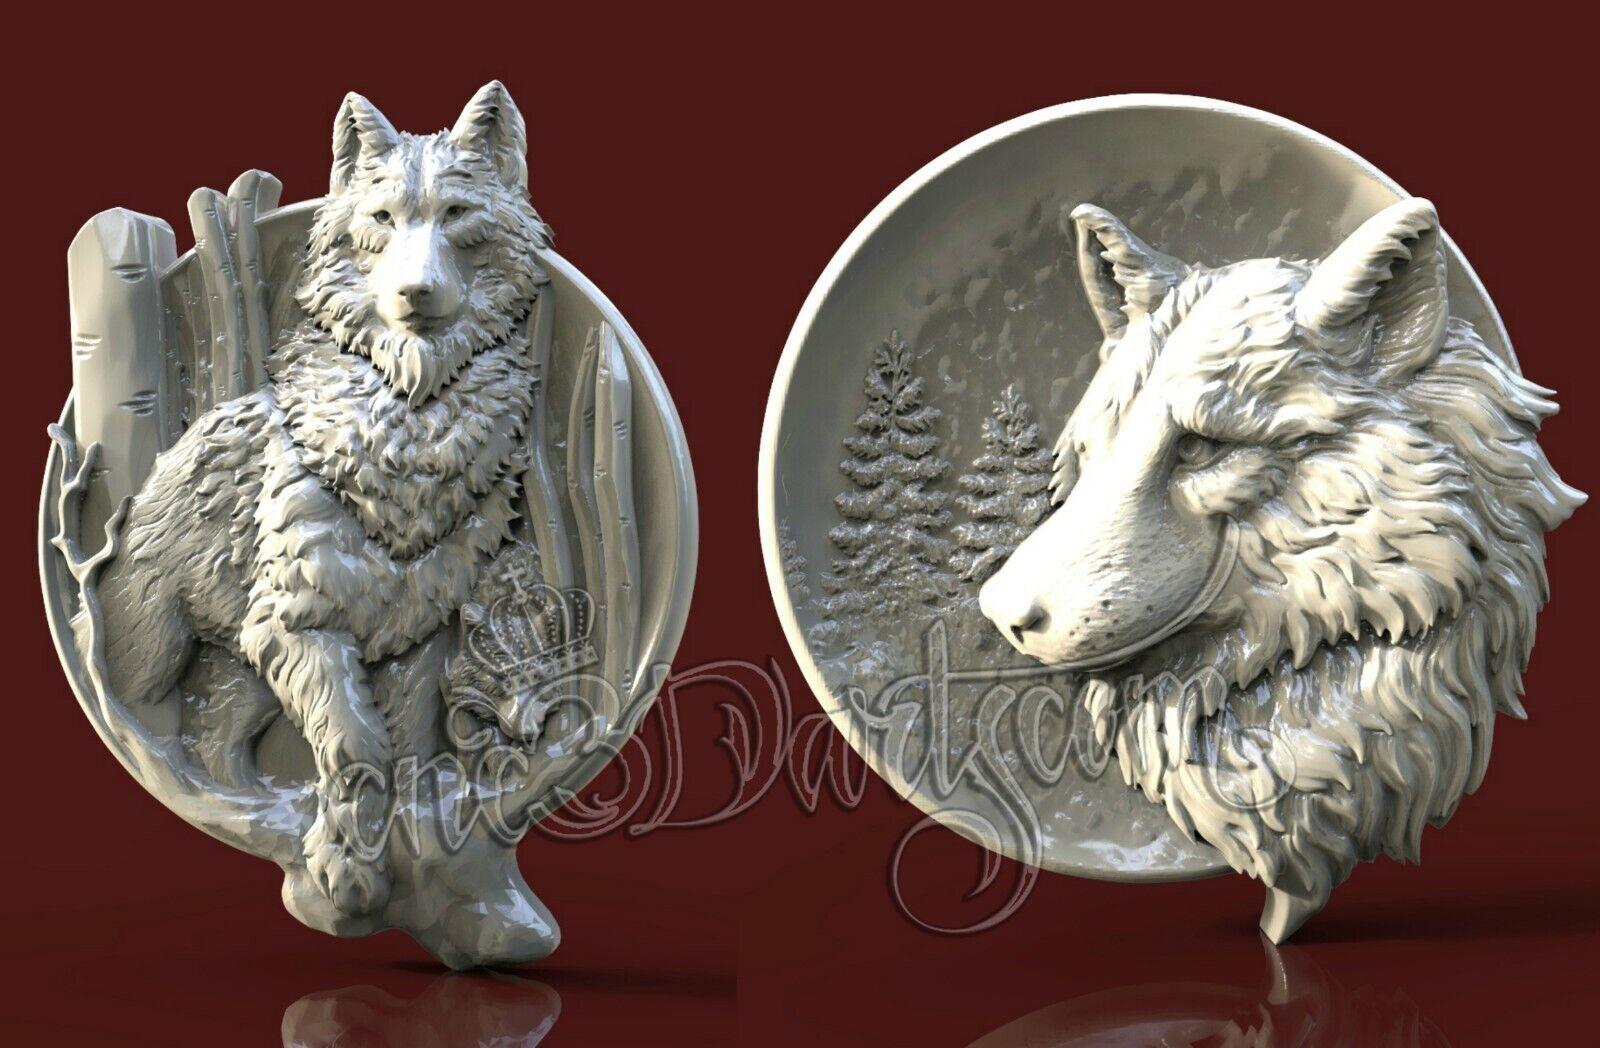 3D modelo STL Para Cnc Router tipo Aspire Animal Wolf Moon Panel Cut3D vcarve